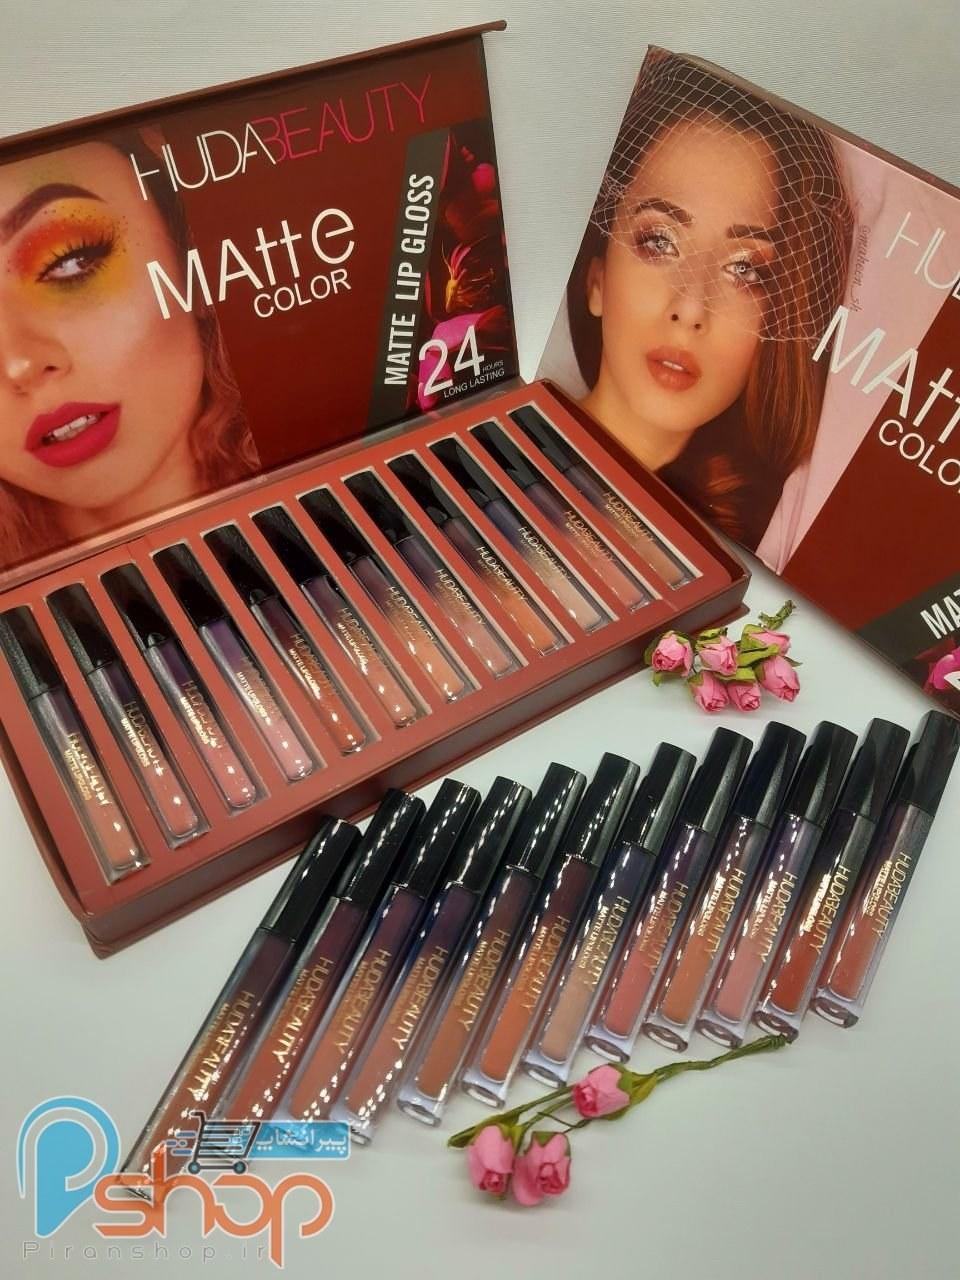 پک رژ لب ۱۲ عددی هدی بیوتی huda beauty matte lip gloss |